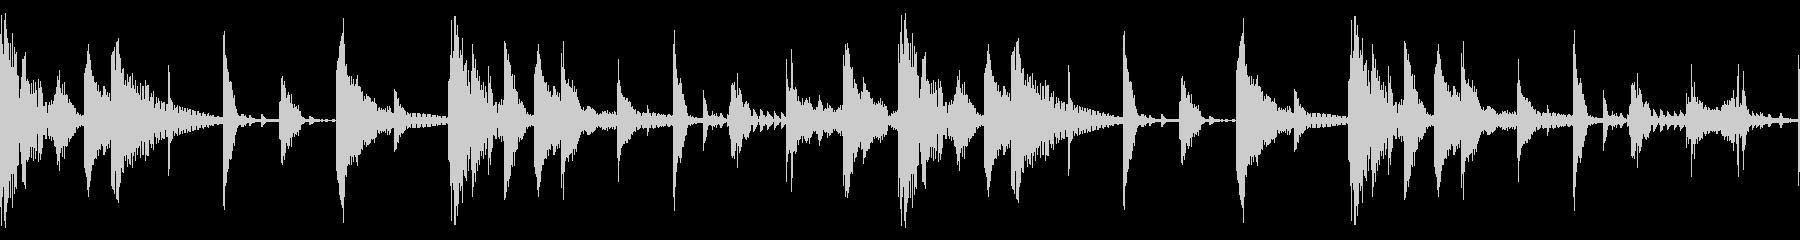 60 BPMの未再生の波形